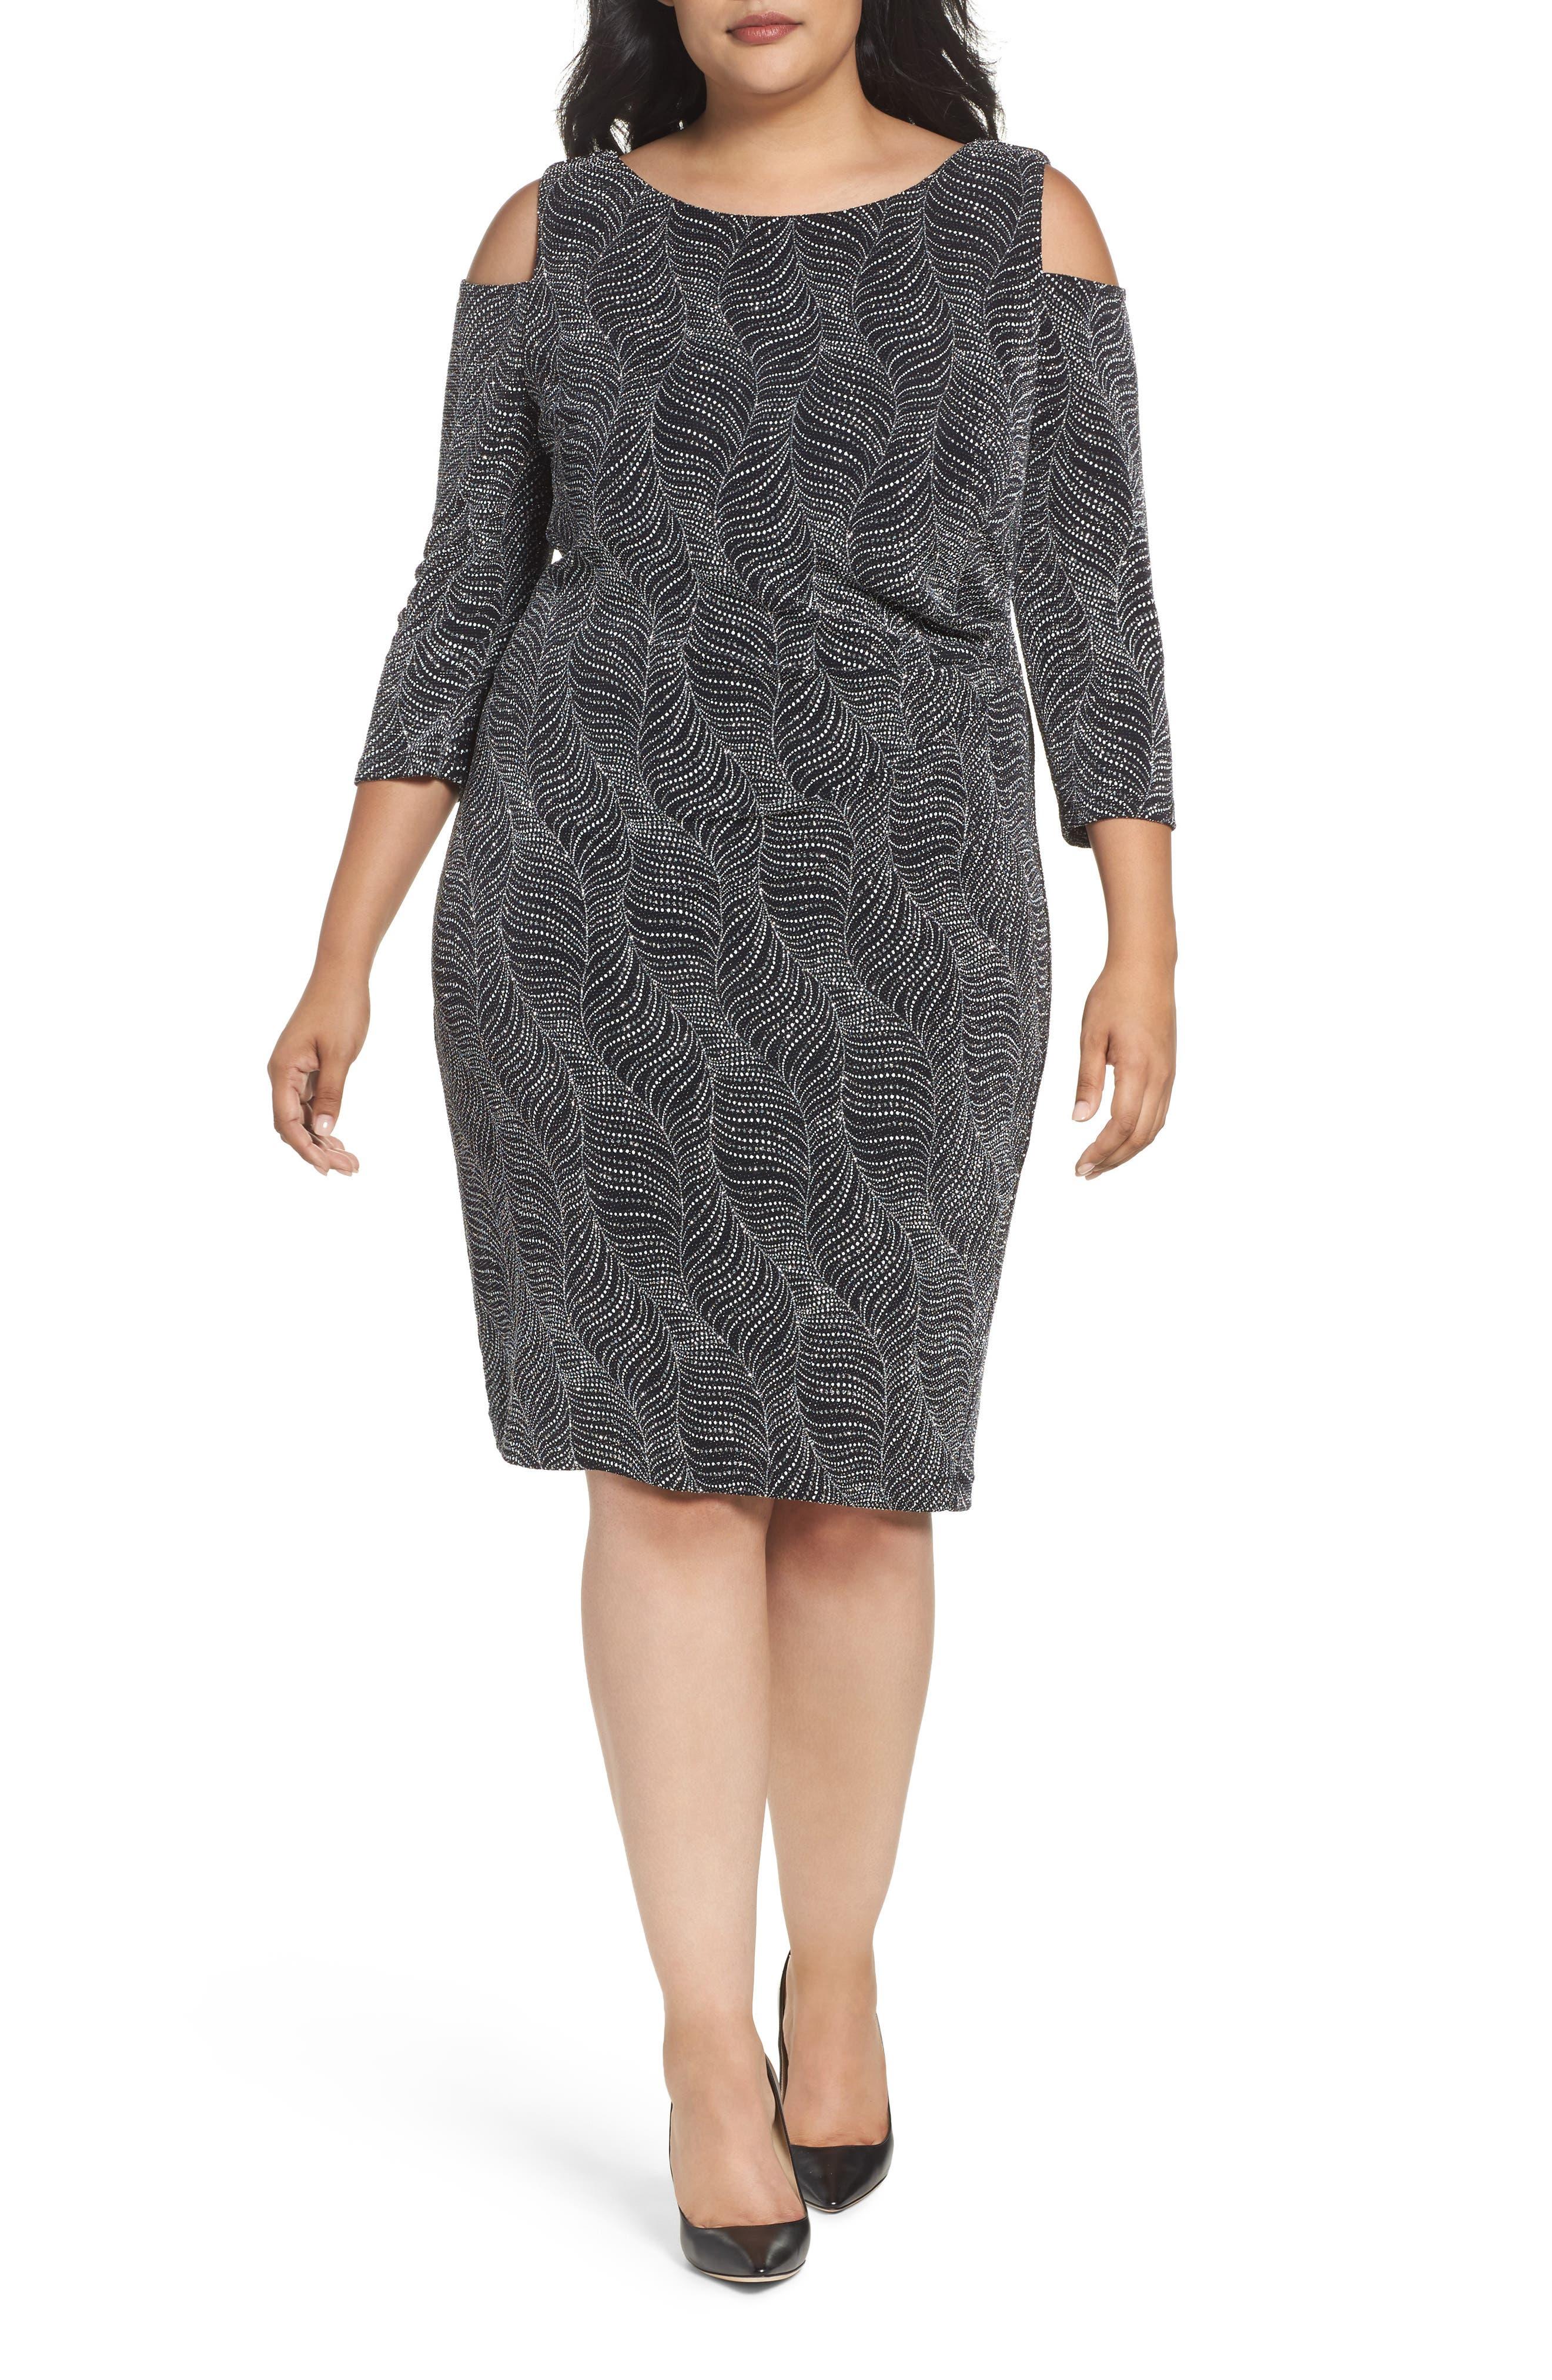 Cold Shoulder Glitter Knit Sheath Dress,                         Main,                         color, Black/ Silver